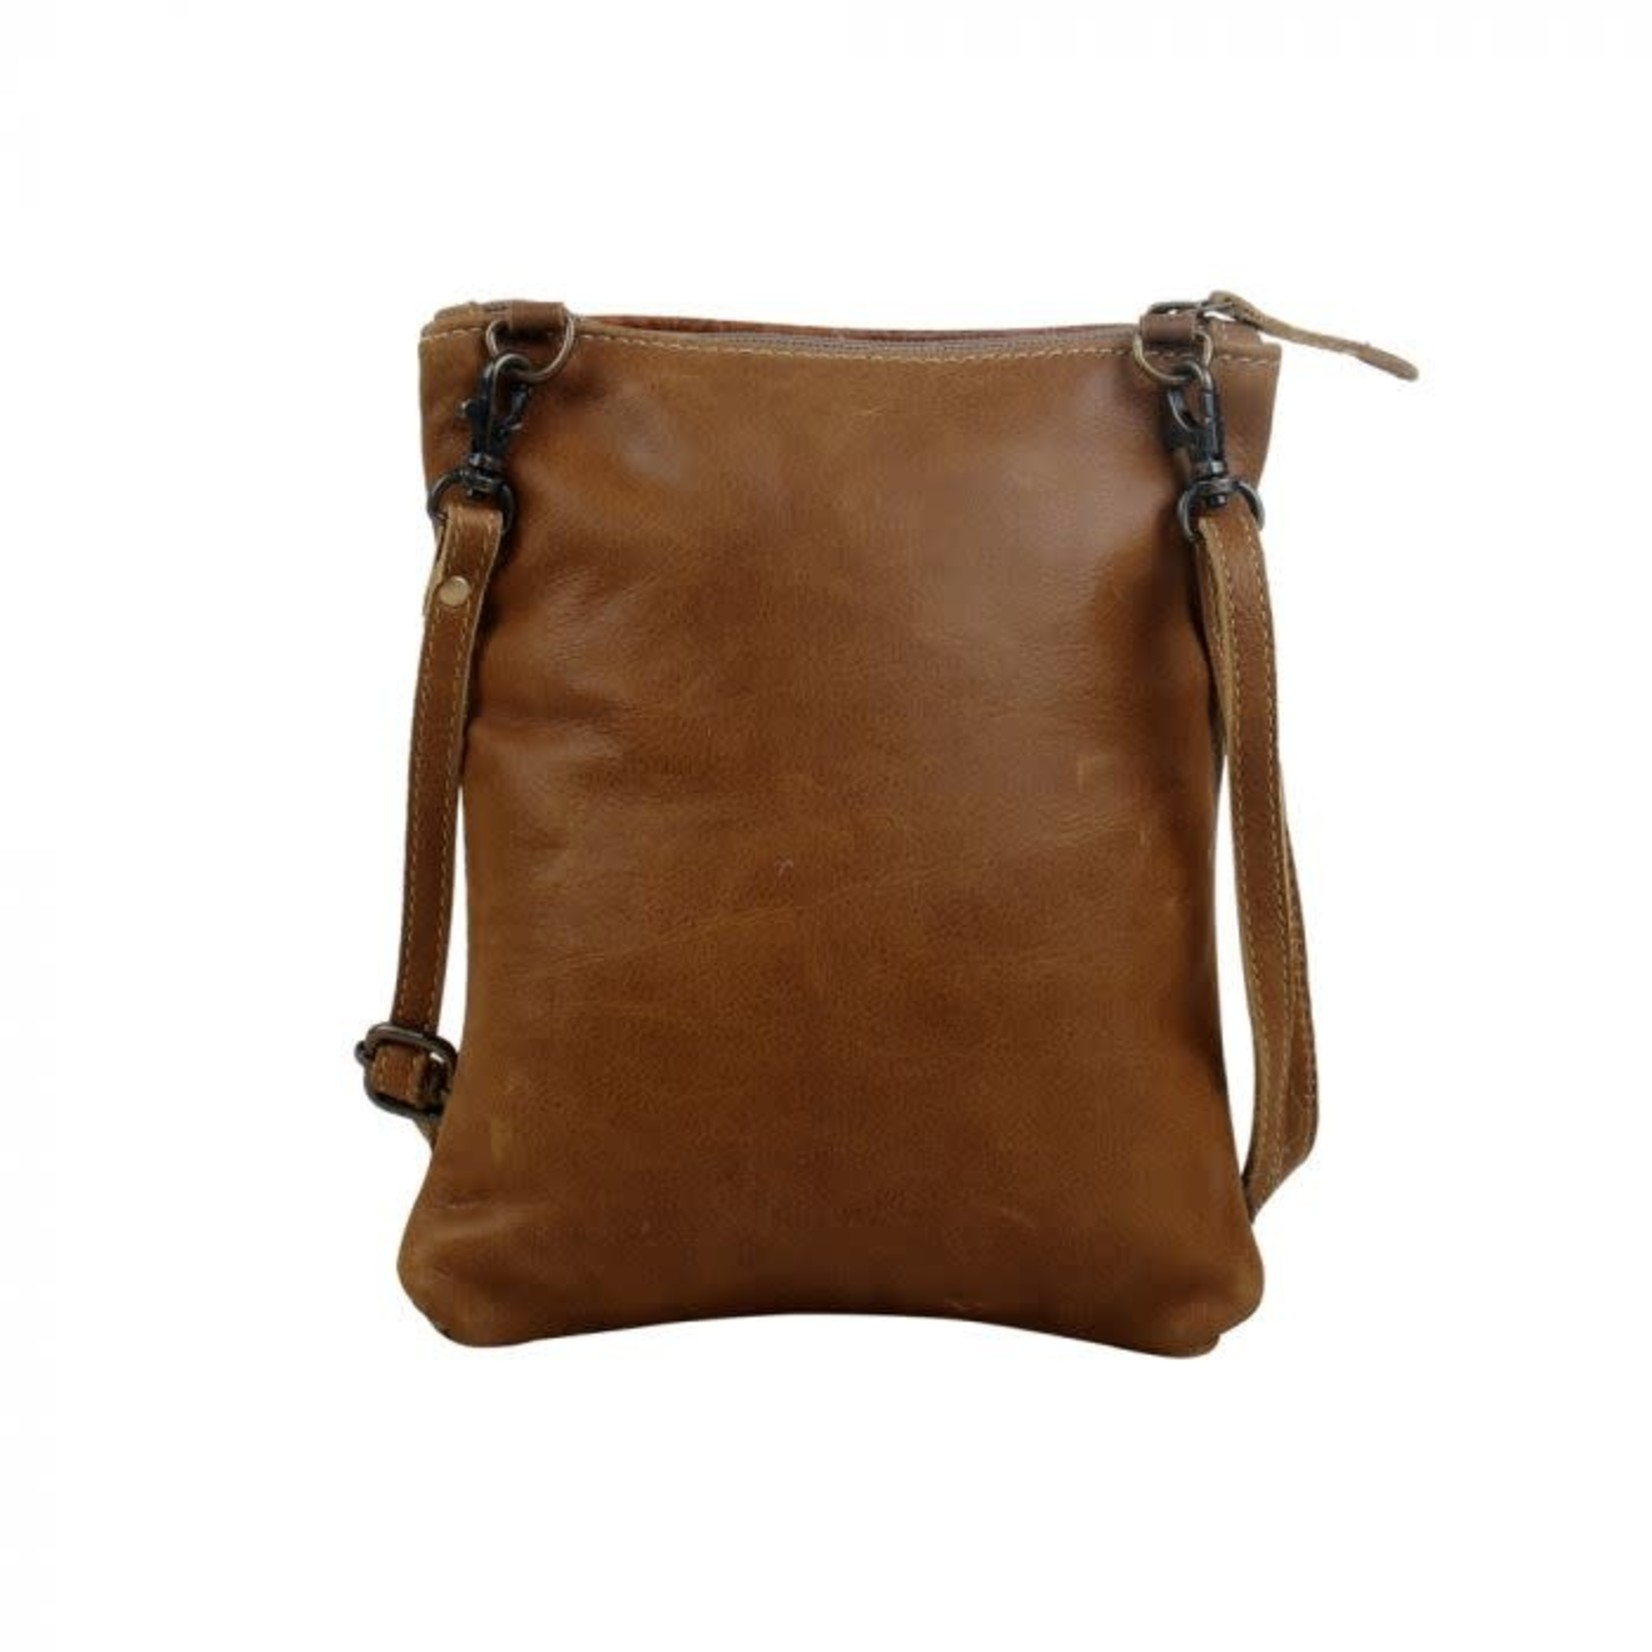 Myra Bag Bag: Solemnly Small Crossbody